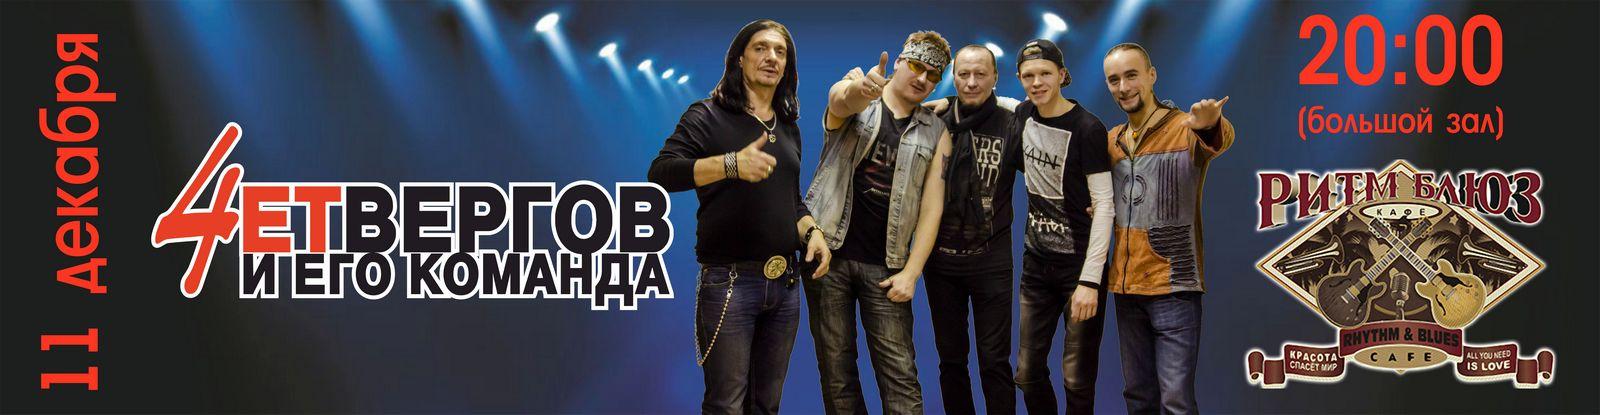 гитарист Дмитрий Четвергов и его команда